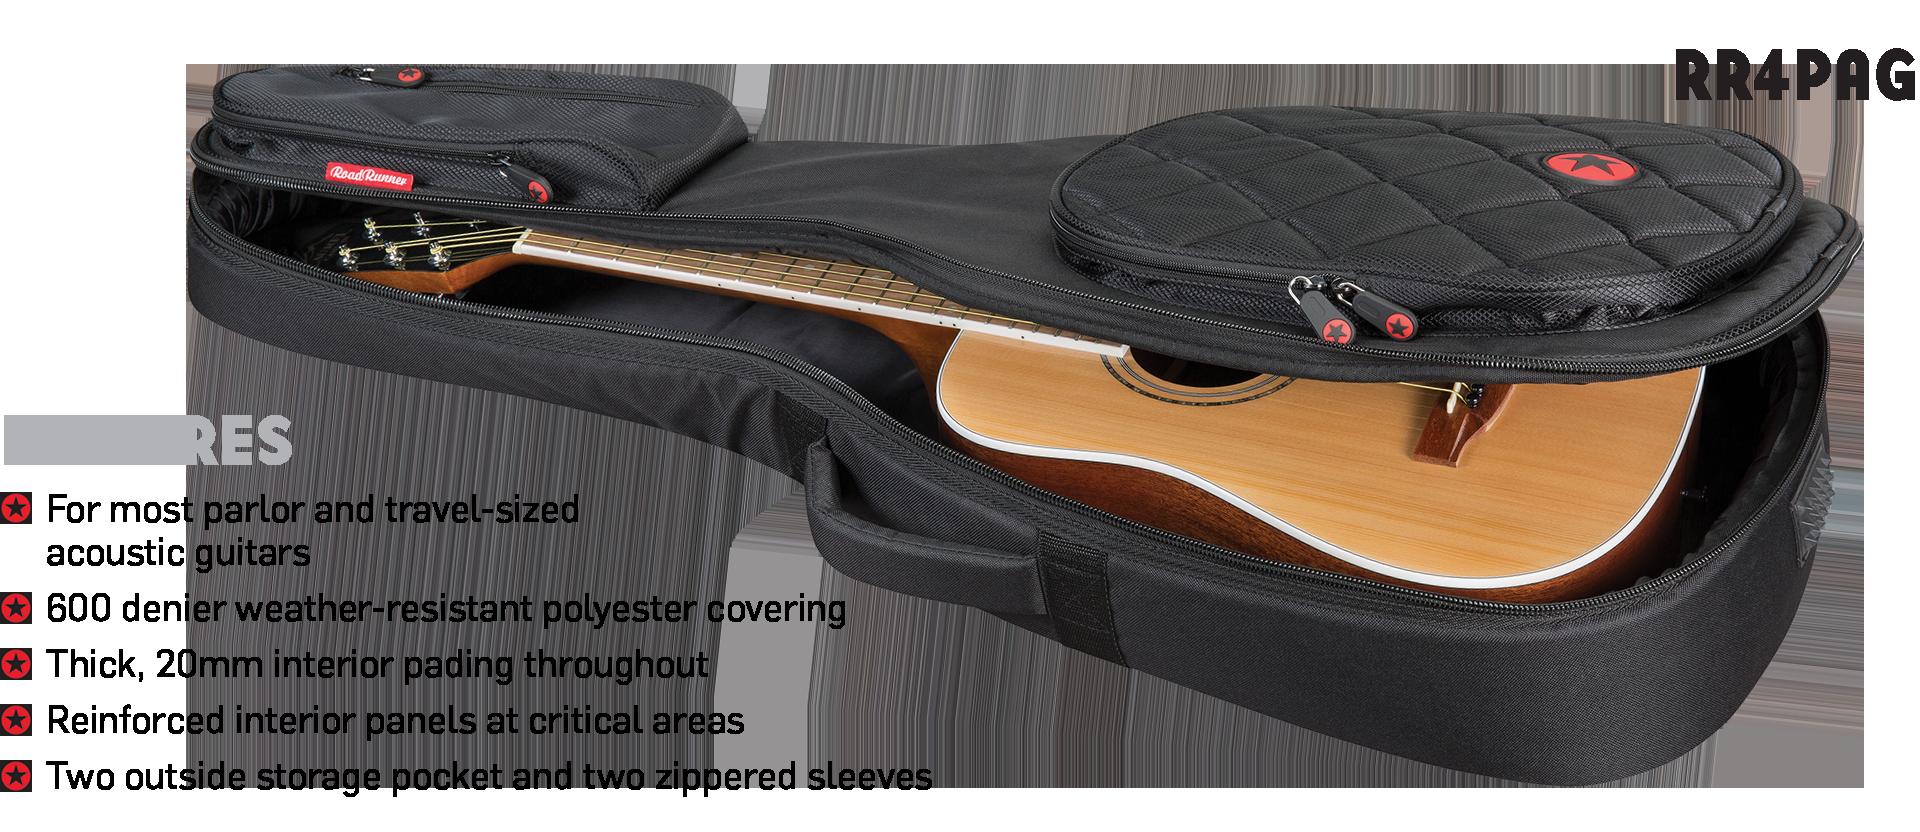 Parlor Acoustic Guitar Gig Bag Road Runner Boulevard RR4PAG